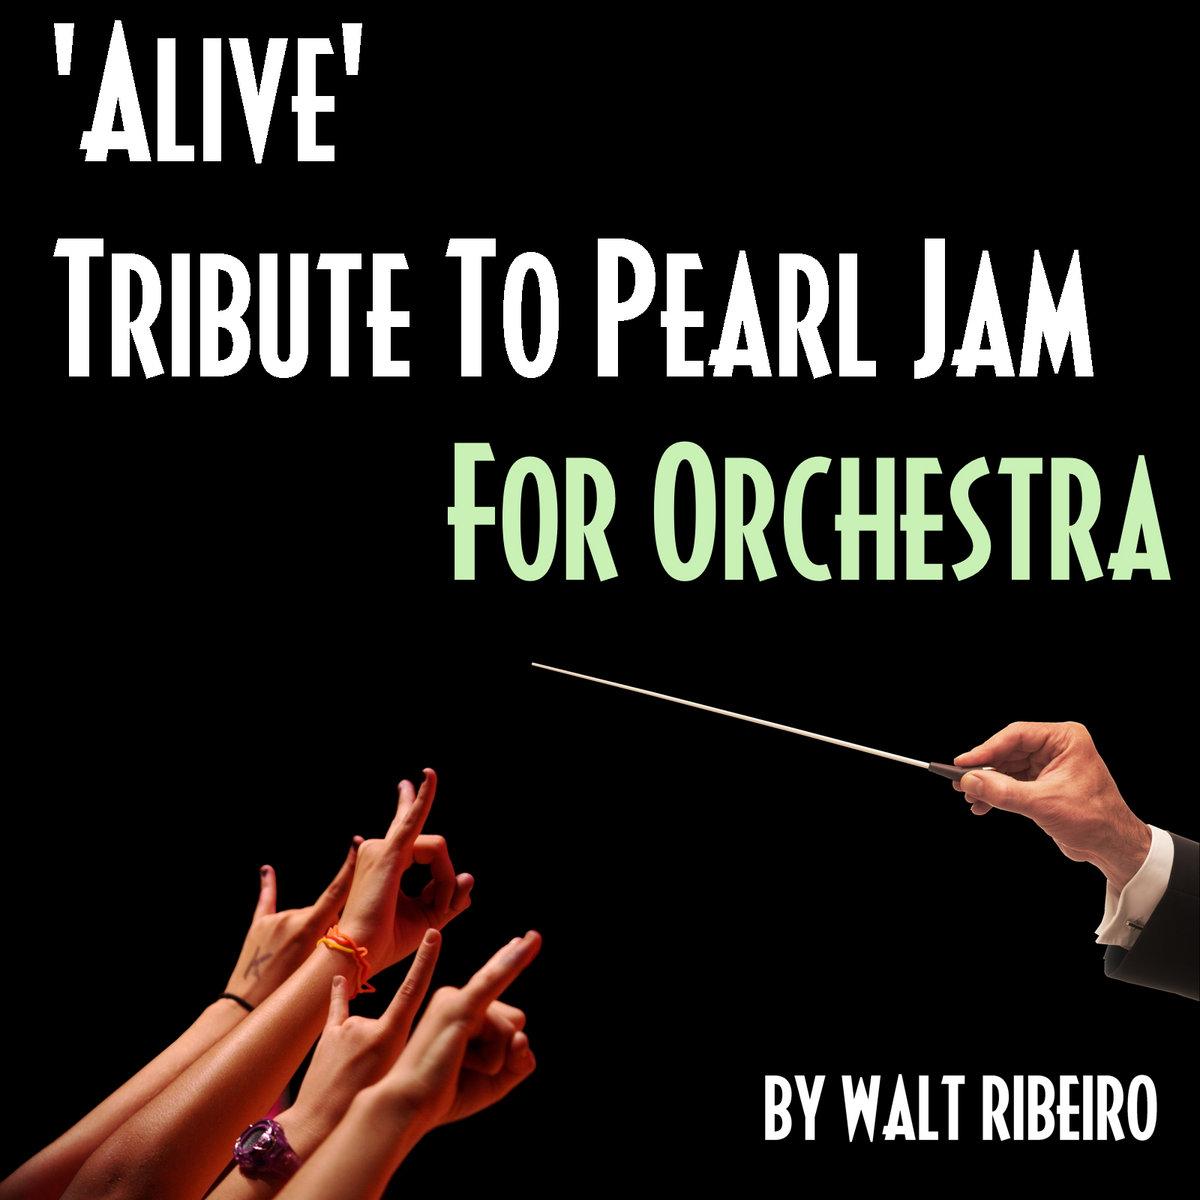 Pearl Jam 'Alive' | Walt Ribeiro